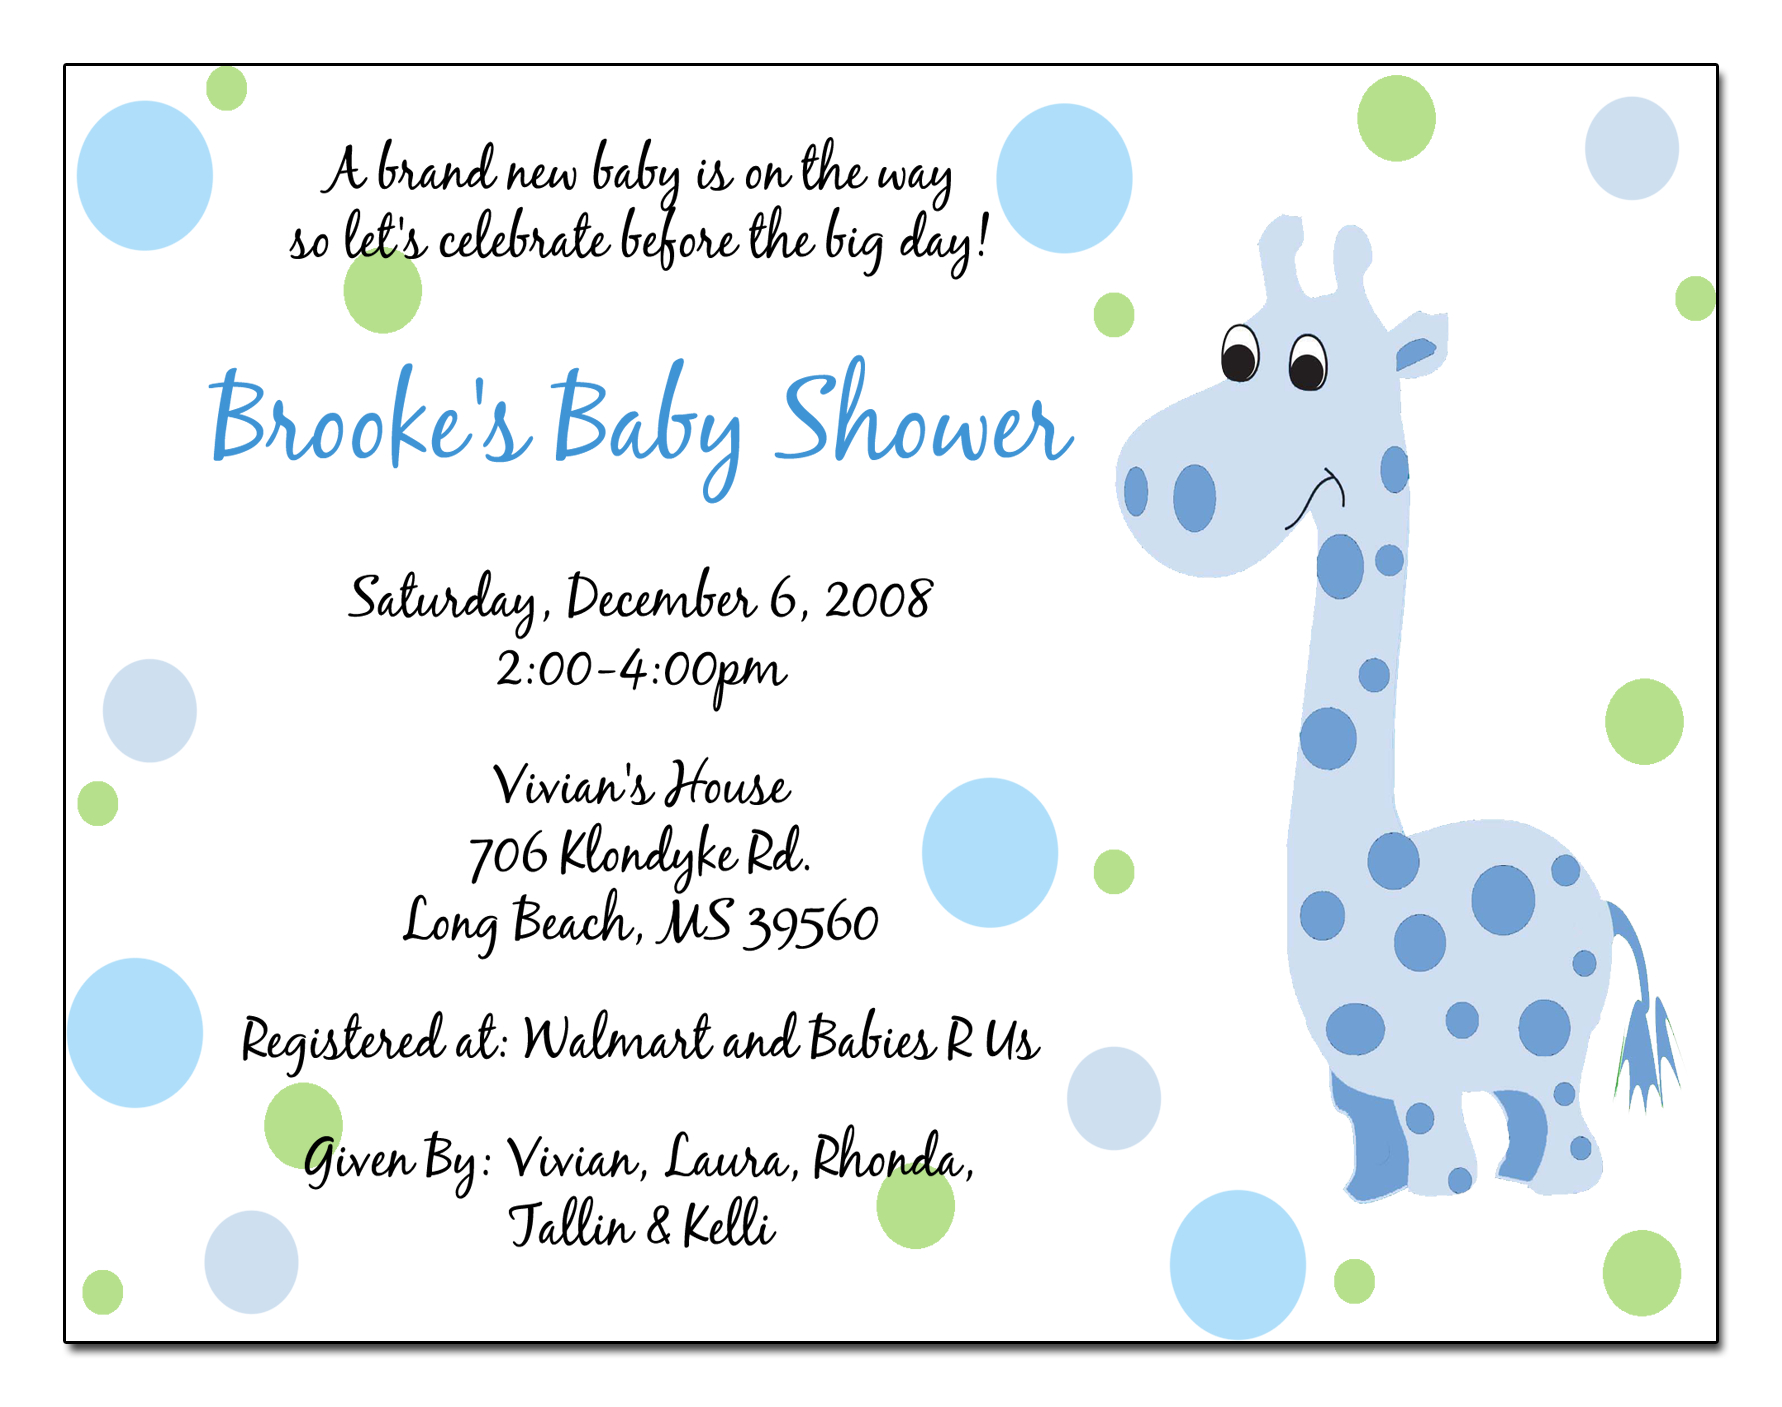 10 Trendy Baby Boy Shower Invitation Ideas photo baby shower invitation wording examples image